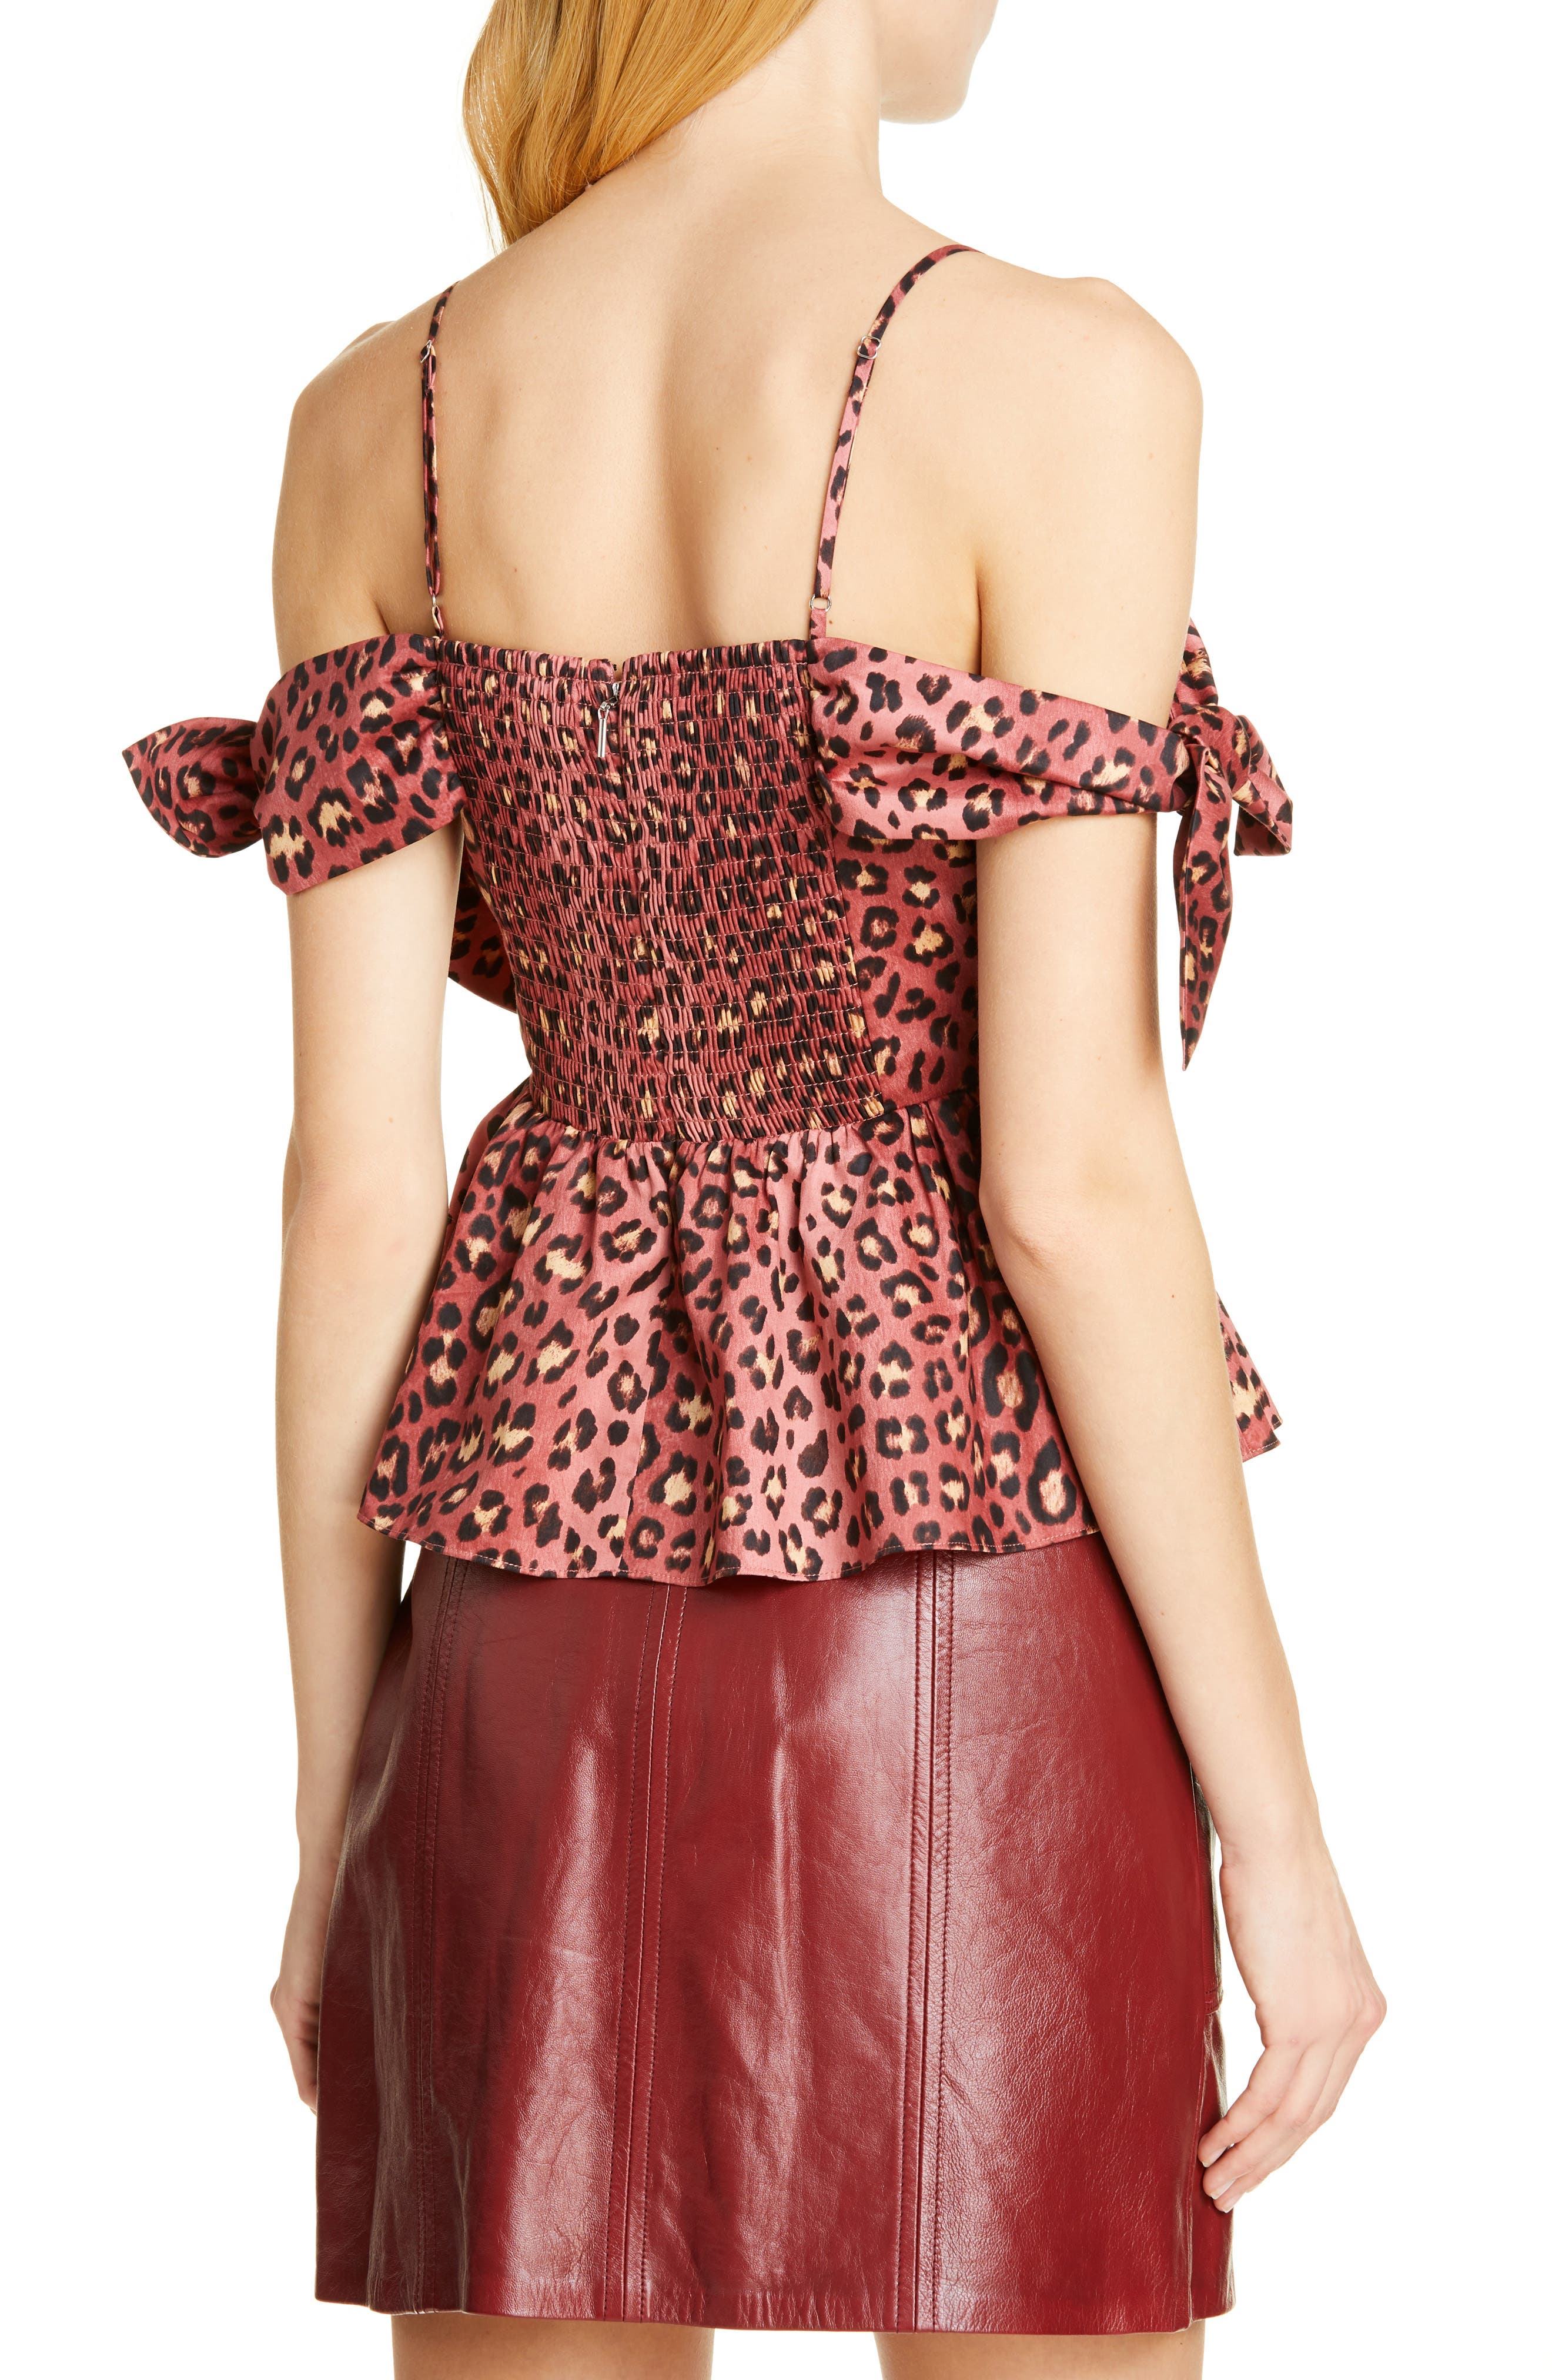 REBECCA TAYLOR, Bow Detail Leopard Print Cold Shoulder Cotton Blouse, Alternate thumbnail 2, color, HENNA